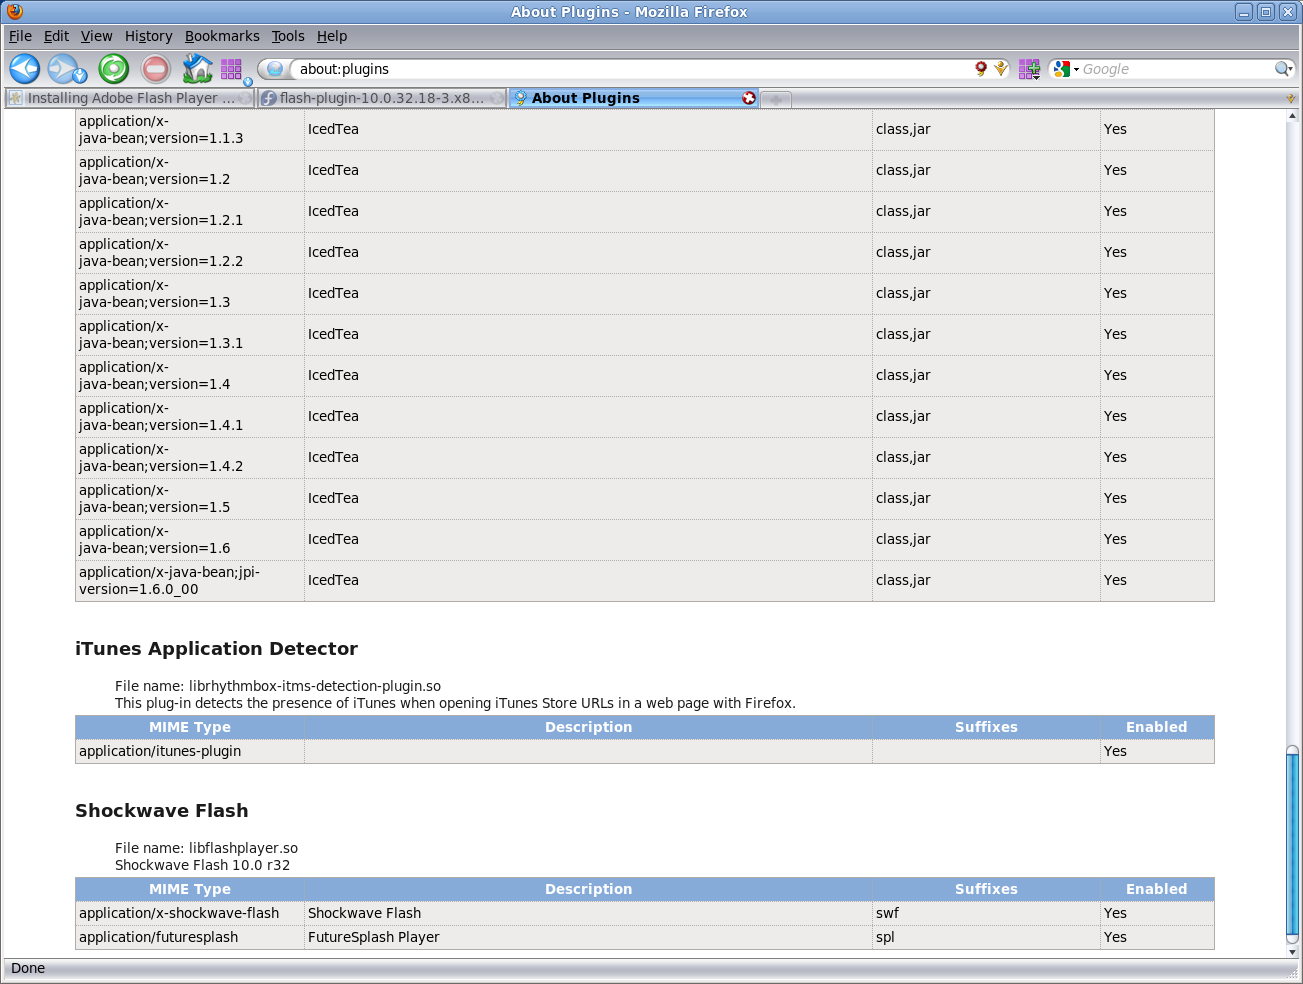 Installing adobe flash player 10 on fedora linux 64 bit Install adobe flash